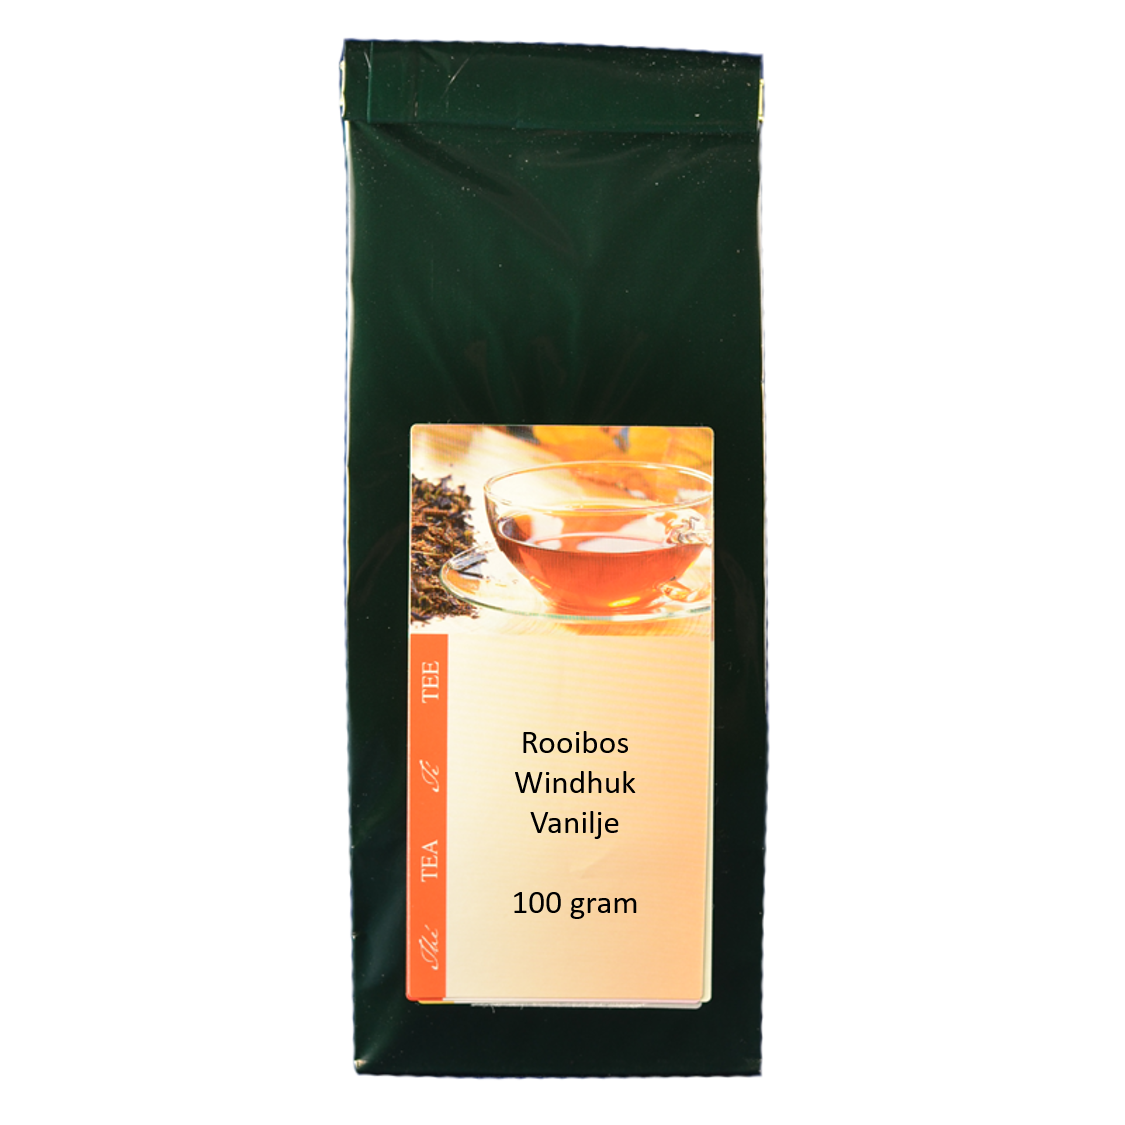 Rooibos Windhuk vanilje 100 g